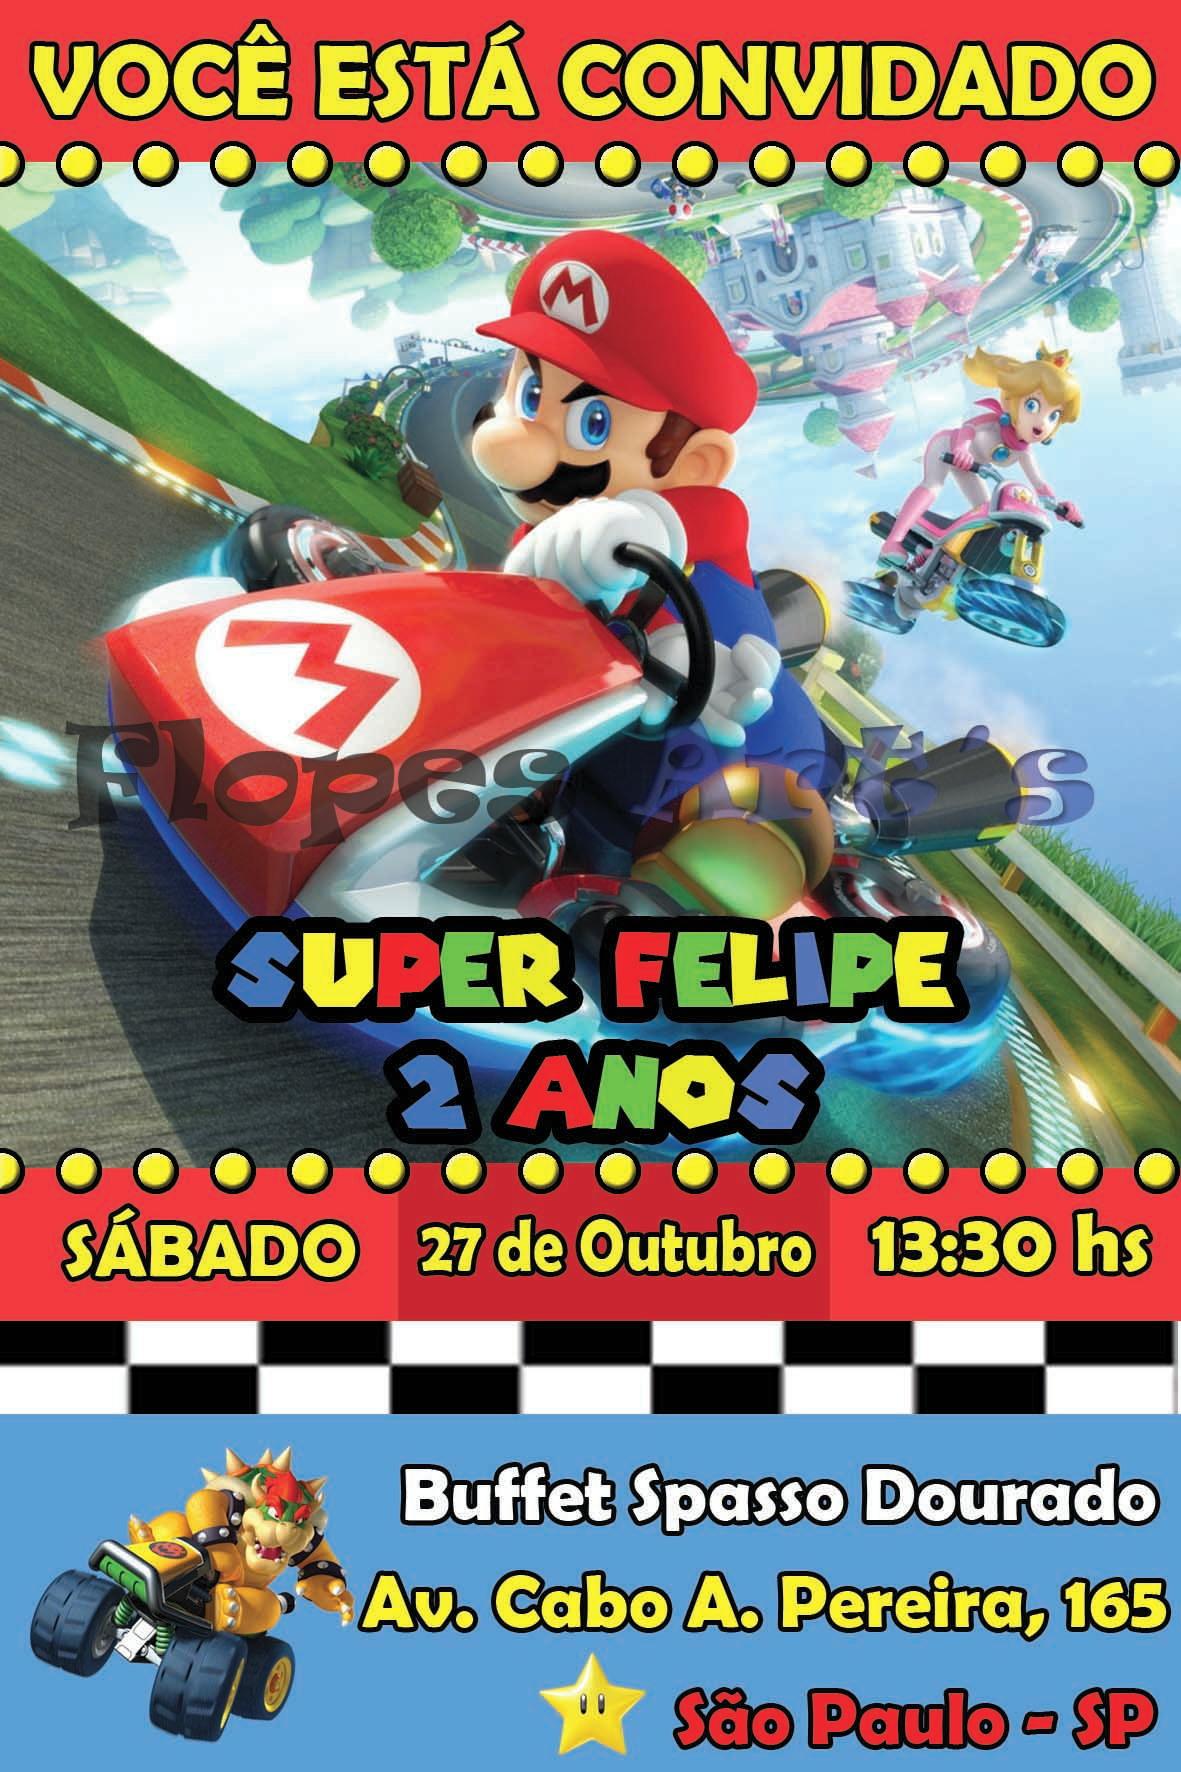 Convite Digital Mario Bros Kart No Elo7 Flopes Arts Da0619